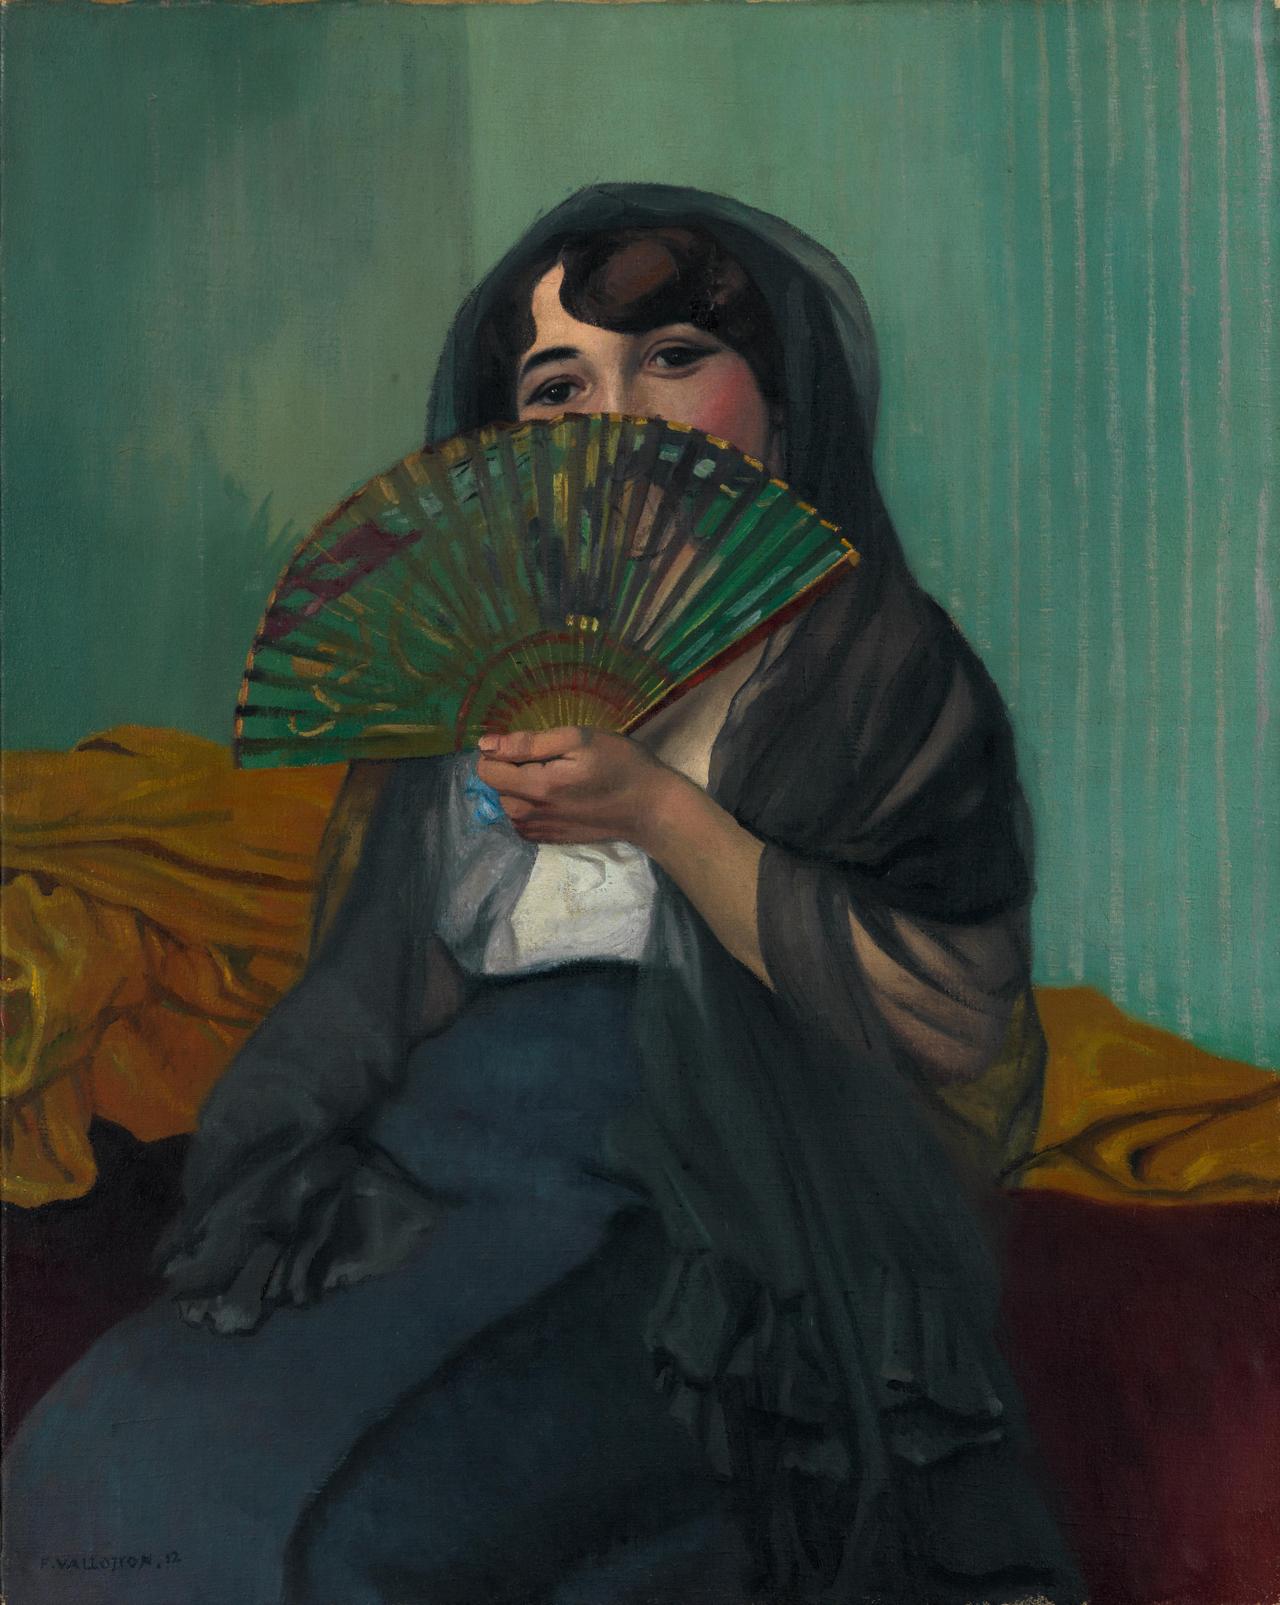 Félix Vallotton, Femme à léventail, 1912, Öl auf Leinwand, 81 x 65 cm